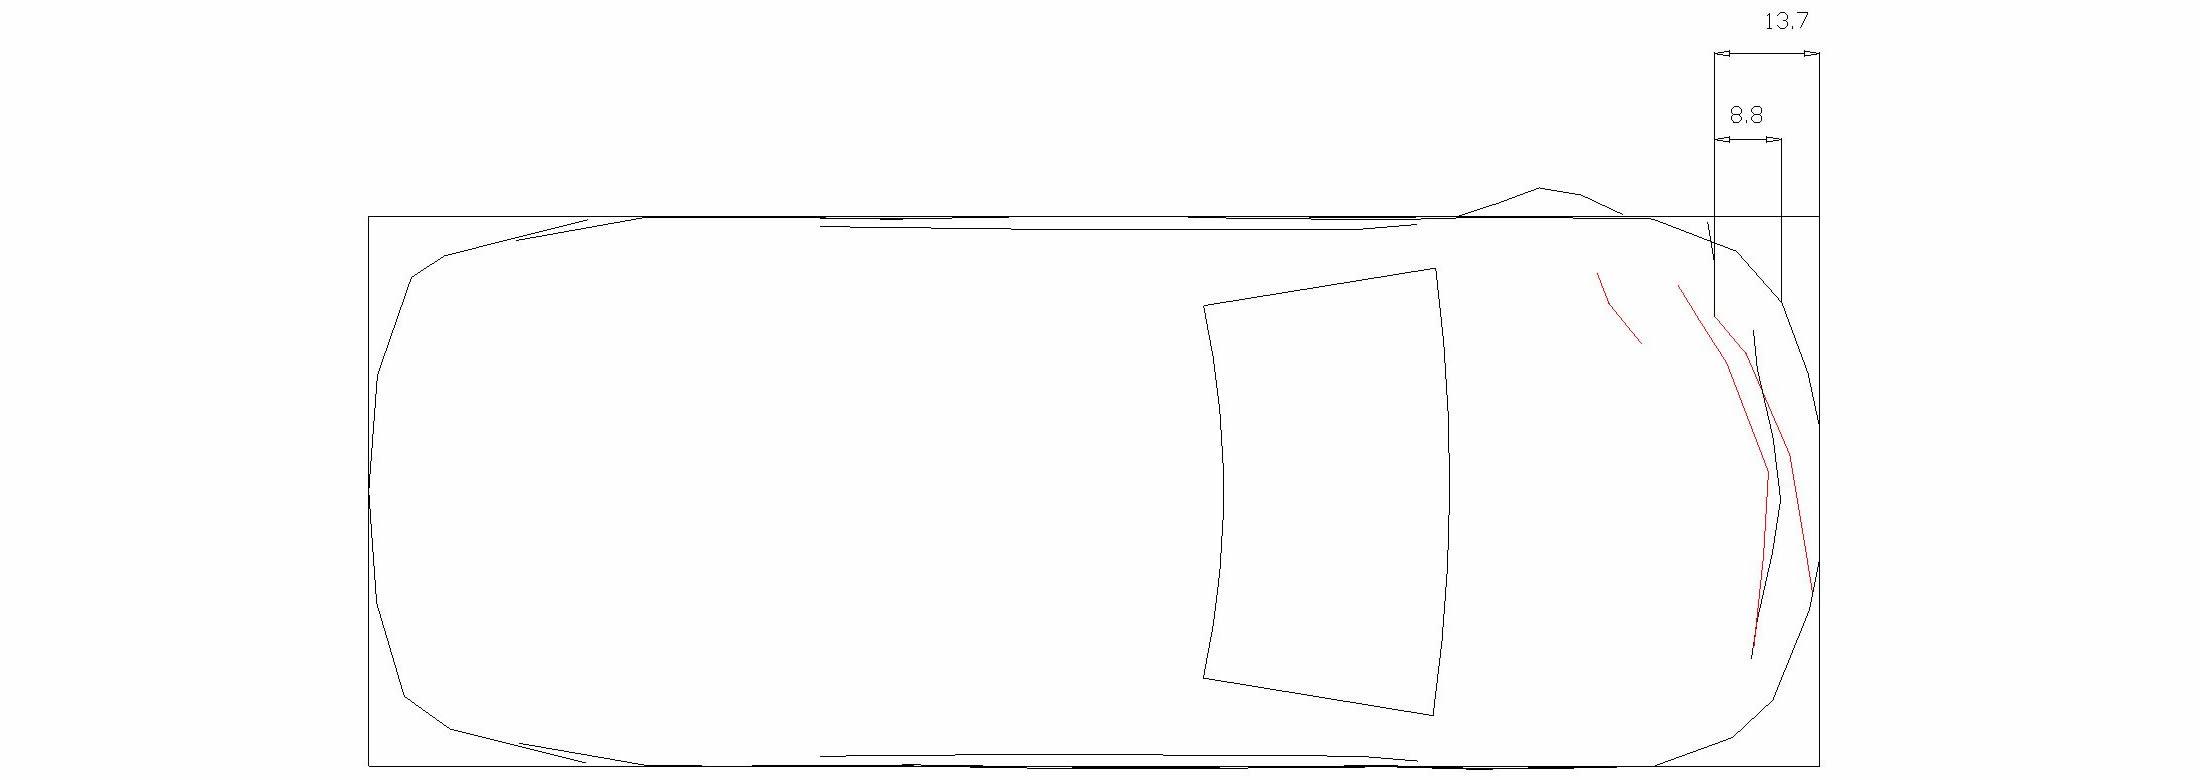 "Lightpoint exemplar model vs. rectangular ""exemplar."""